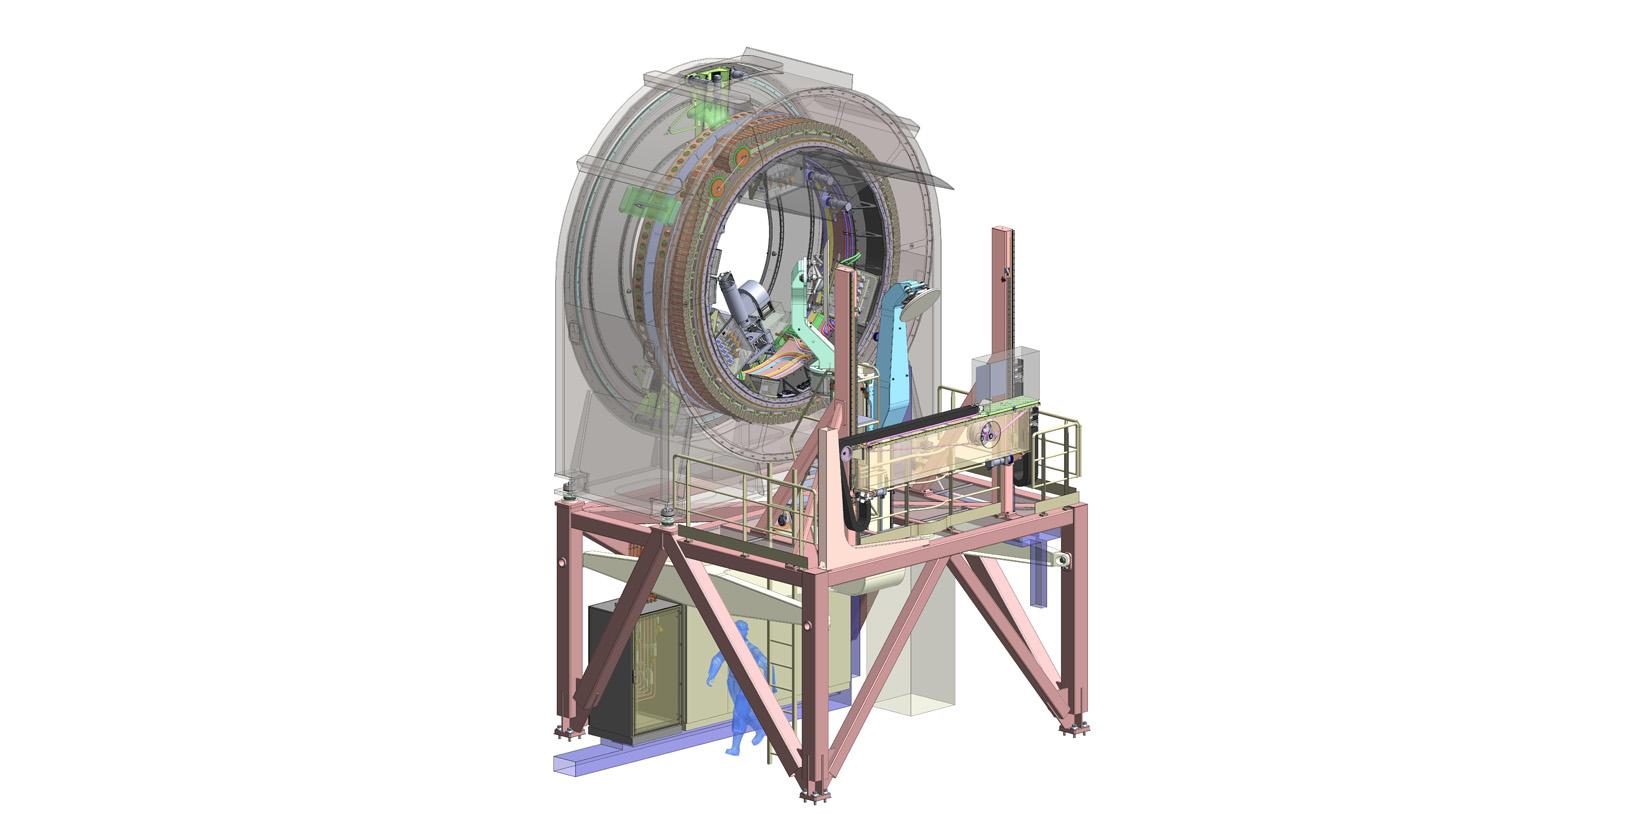 Prefocal_Stations_ELT_Extremely_Large_Telescope_Chile_IDOM (4)